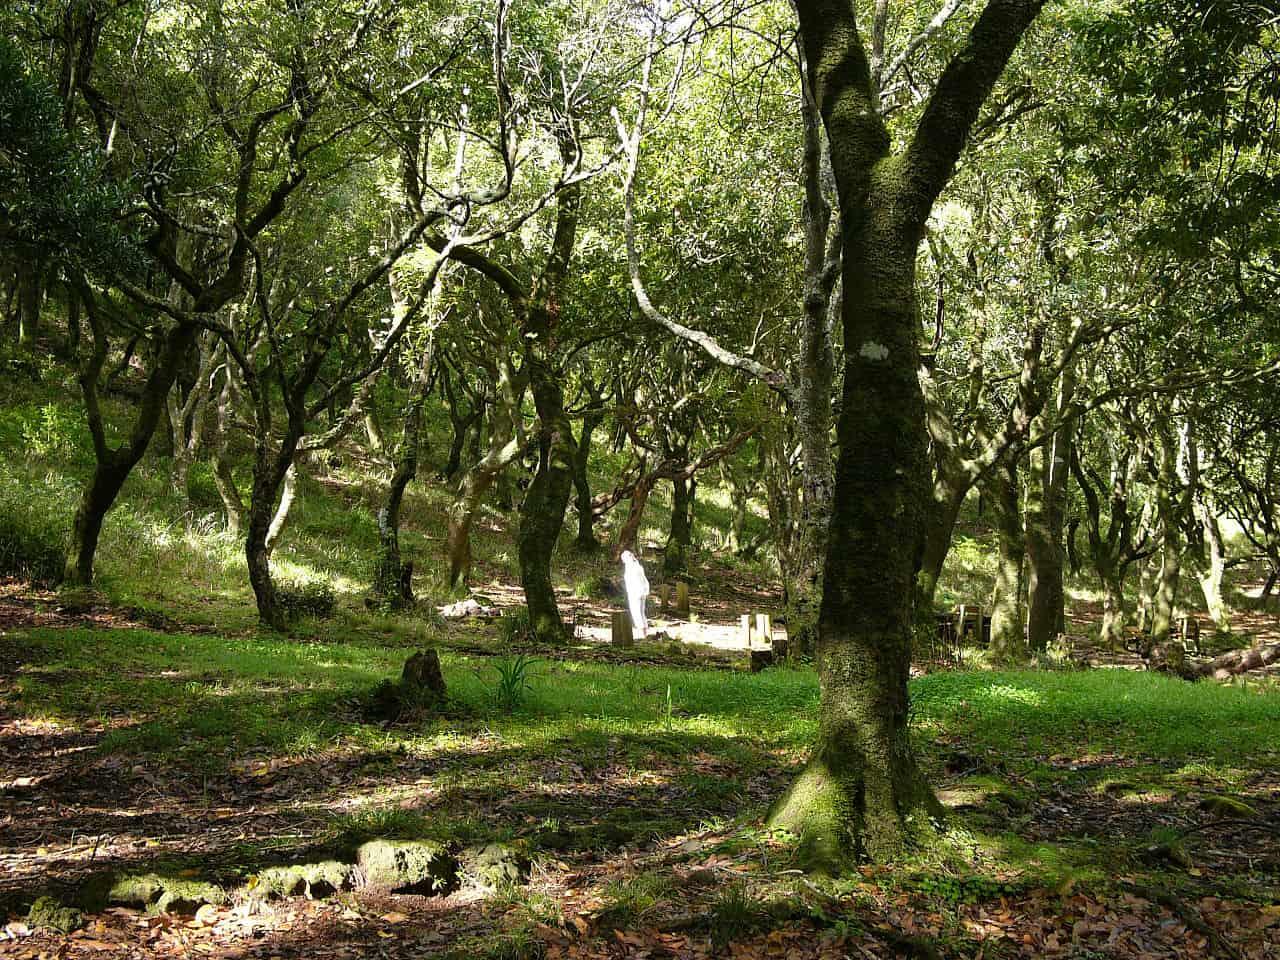 laurel wood, nobel prize